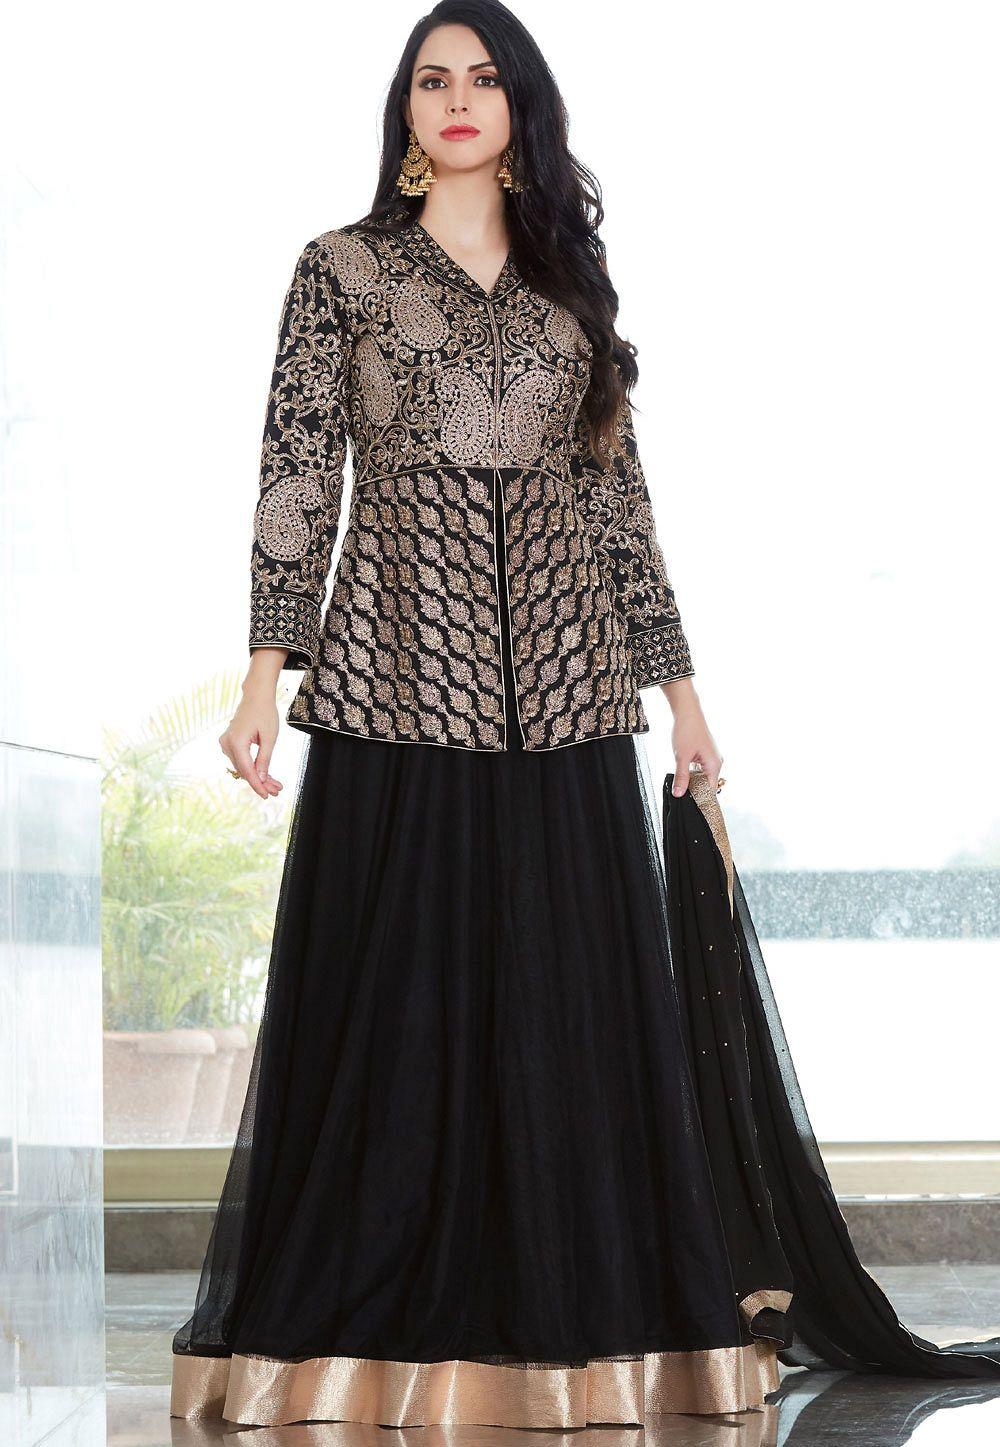 cffec816d3 Black Net Long Jacket Embroidered Lehenga Style Suit 2504